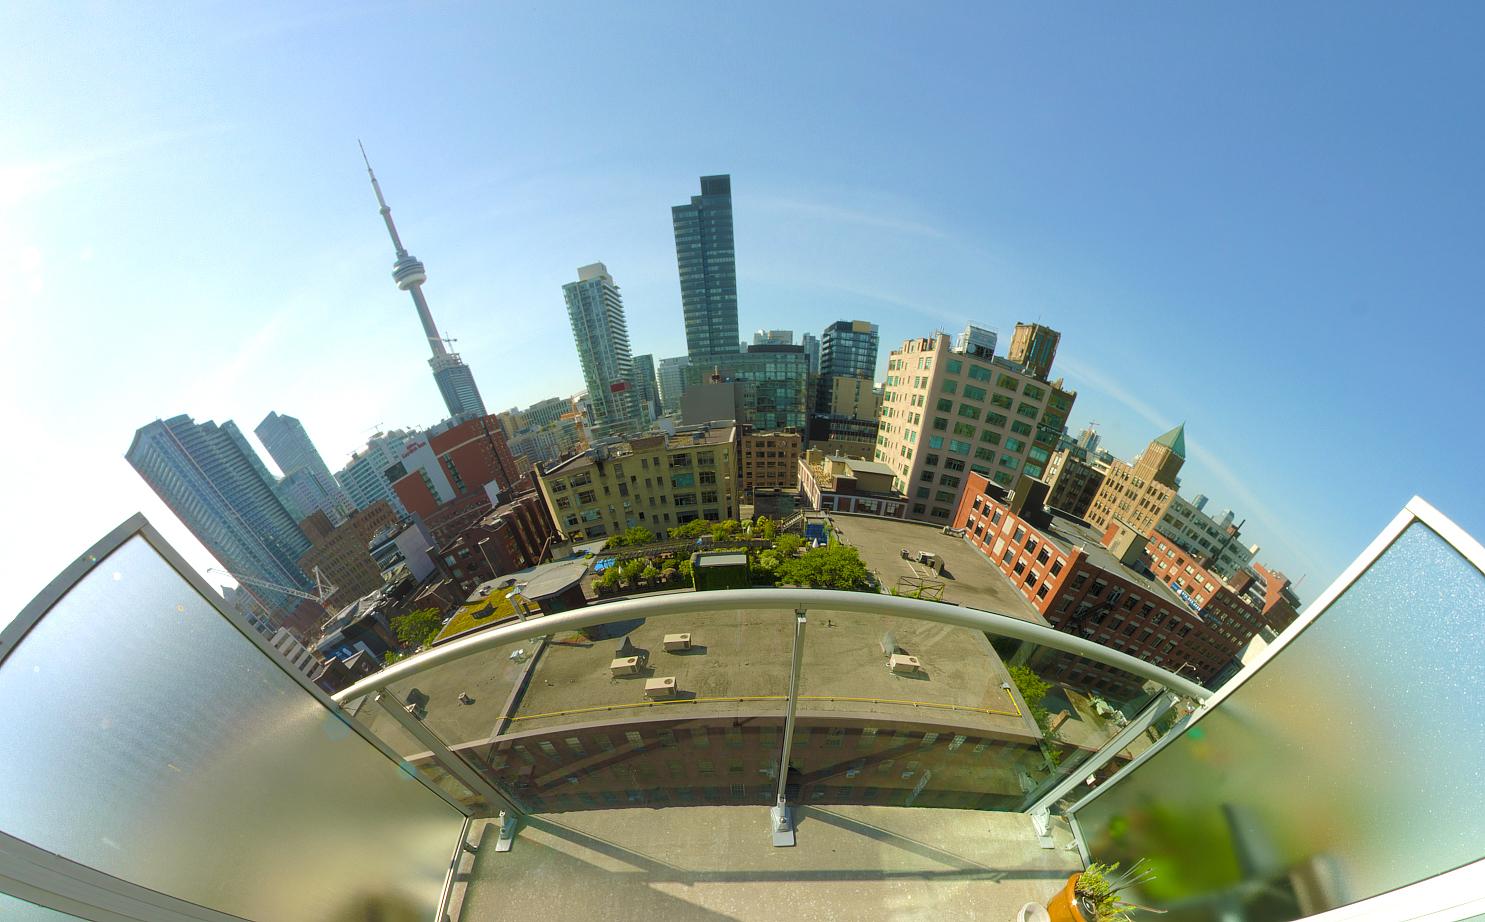 Toronto_LittlePlanetB_hdr.jpg